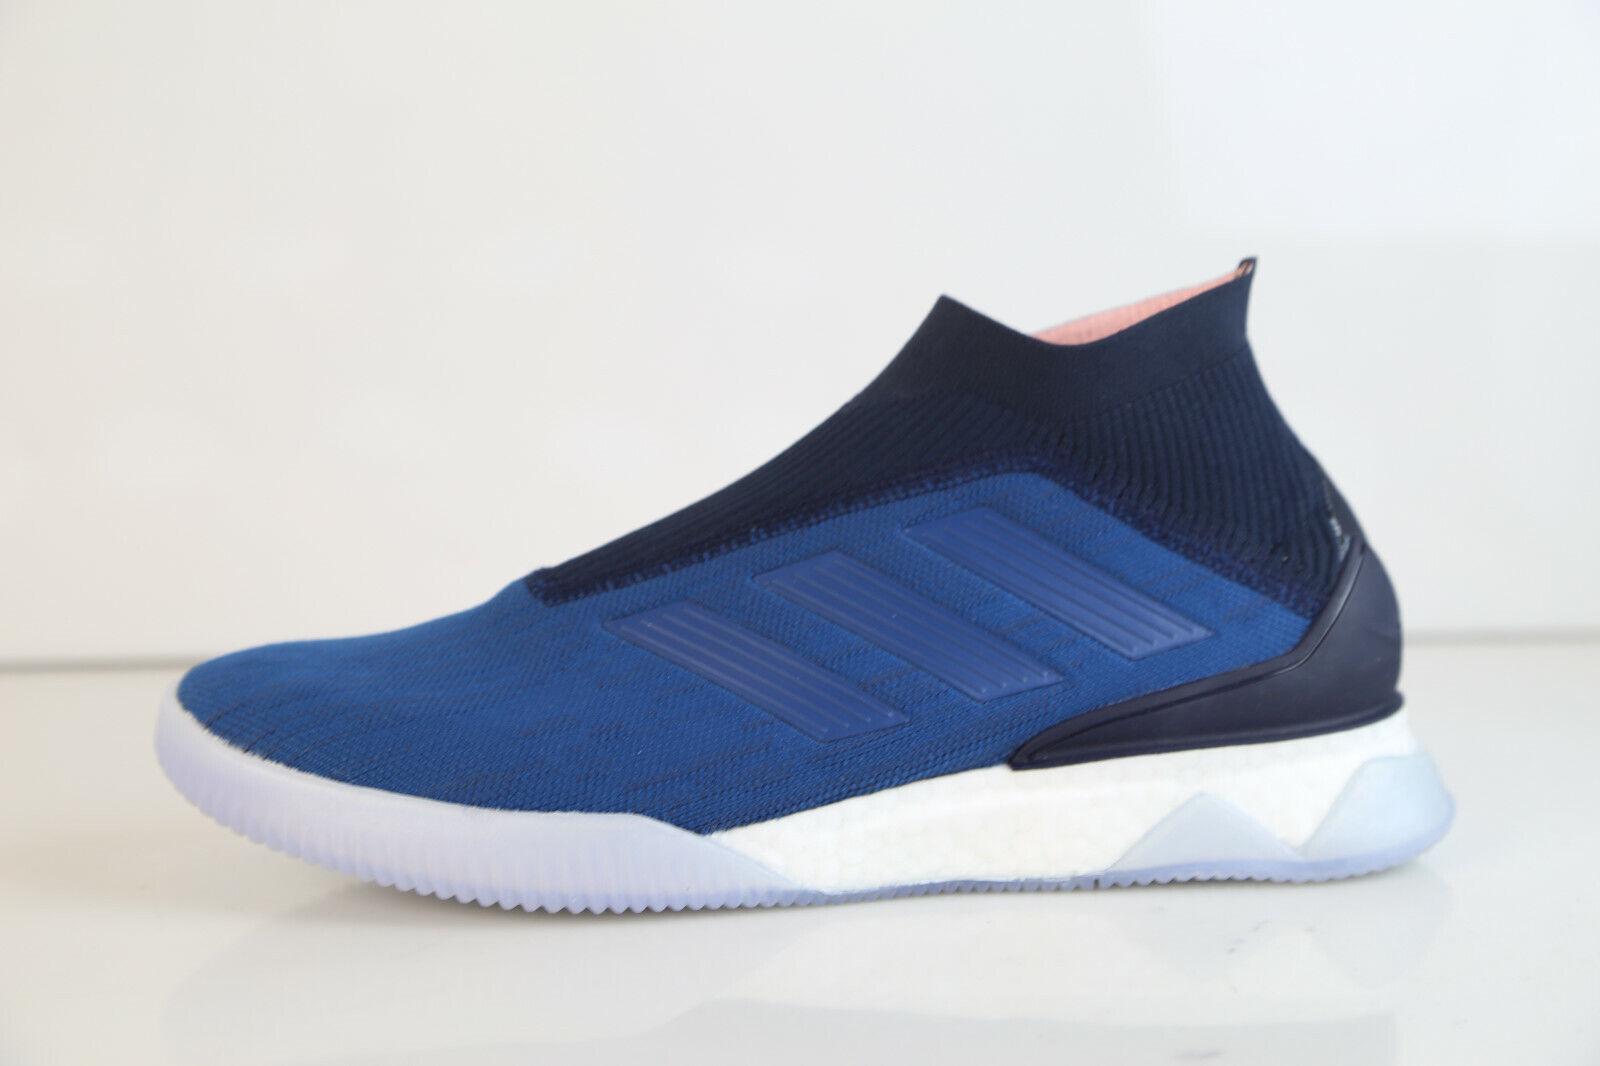 Adidas Projoator Tango 18+ TR Boost Trace Real Azul Negro AQ0605 8-12